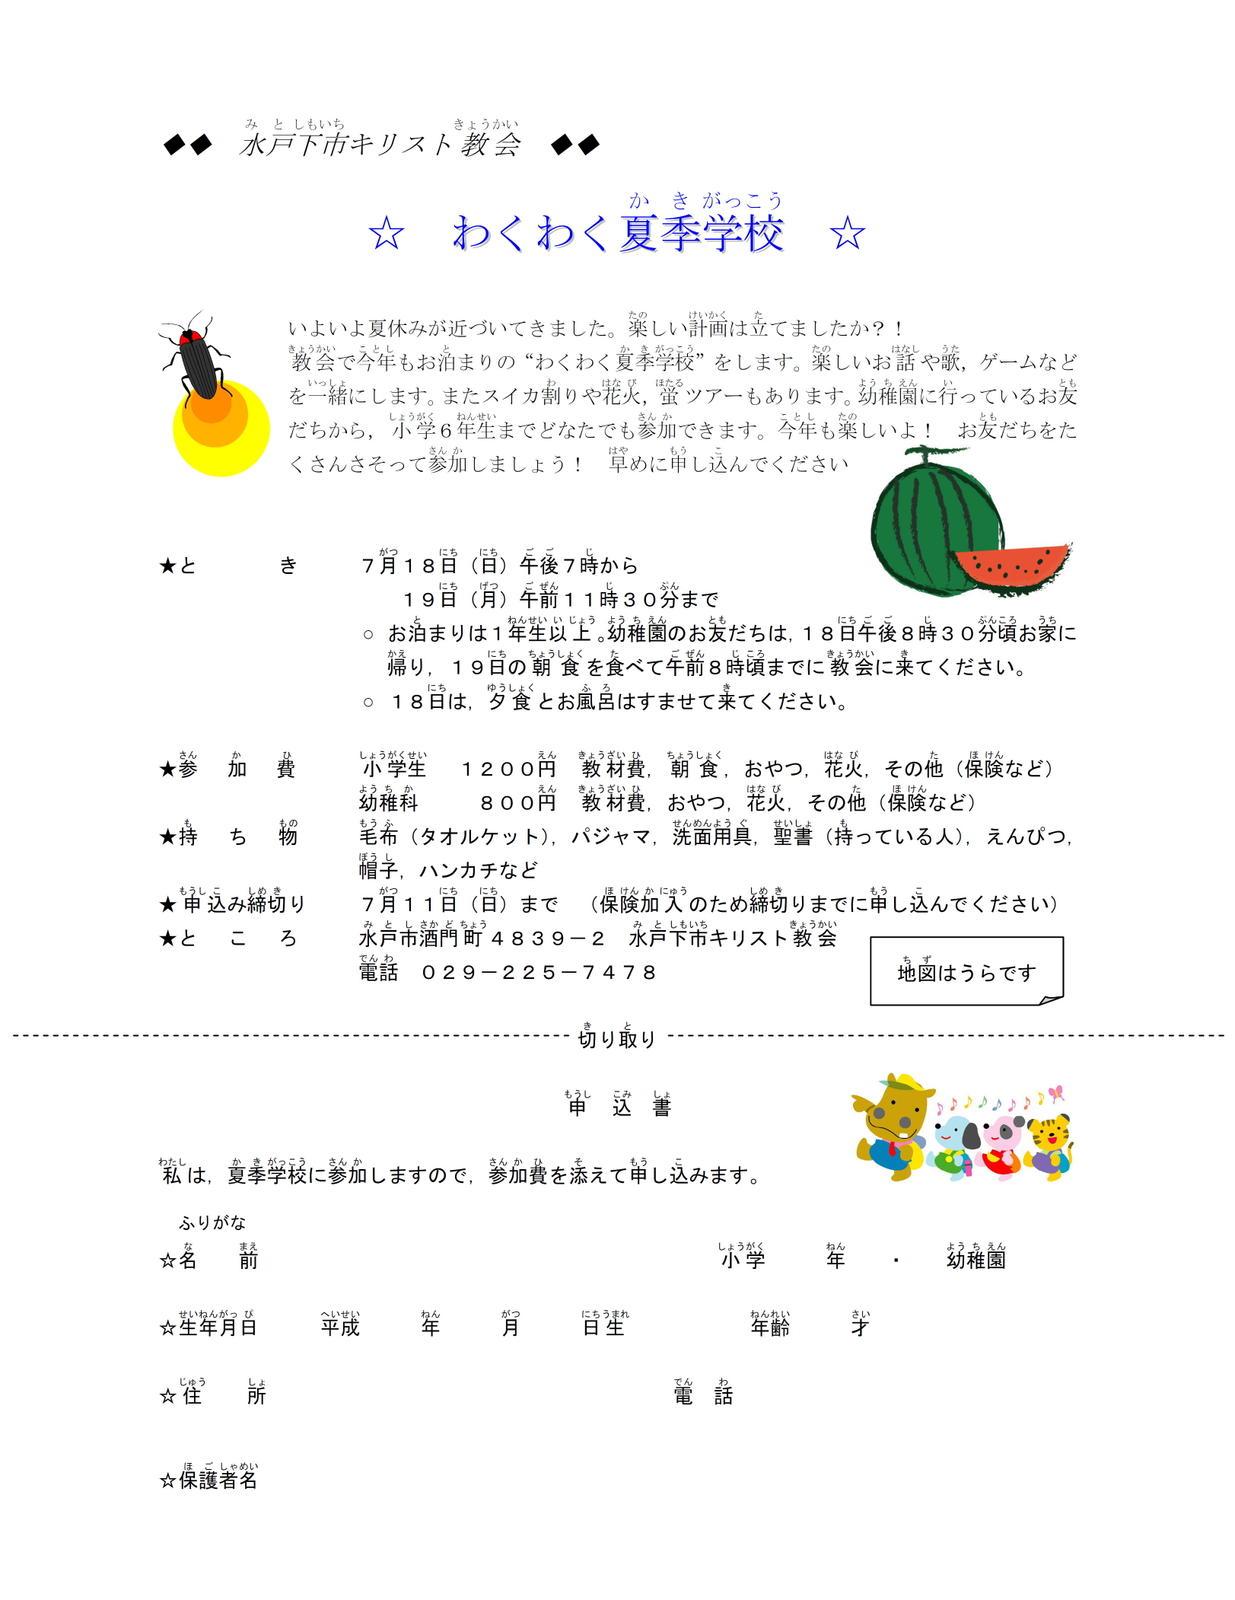 10cs__10070217_4